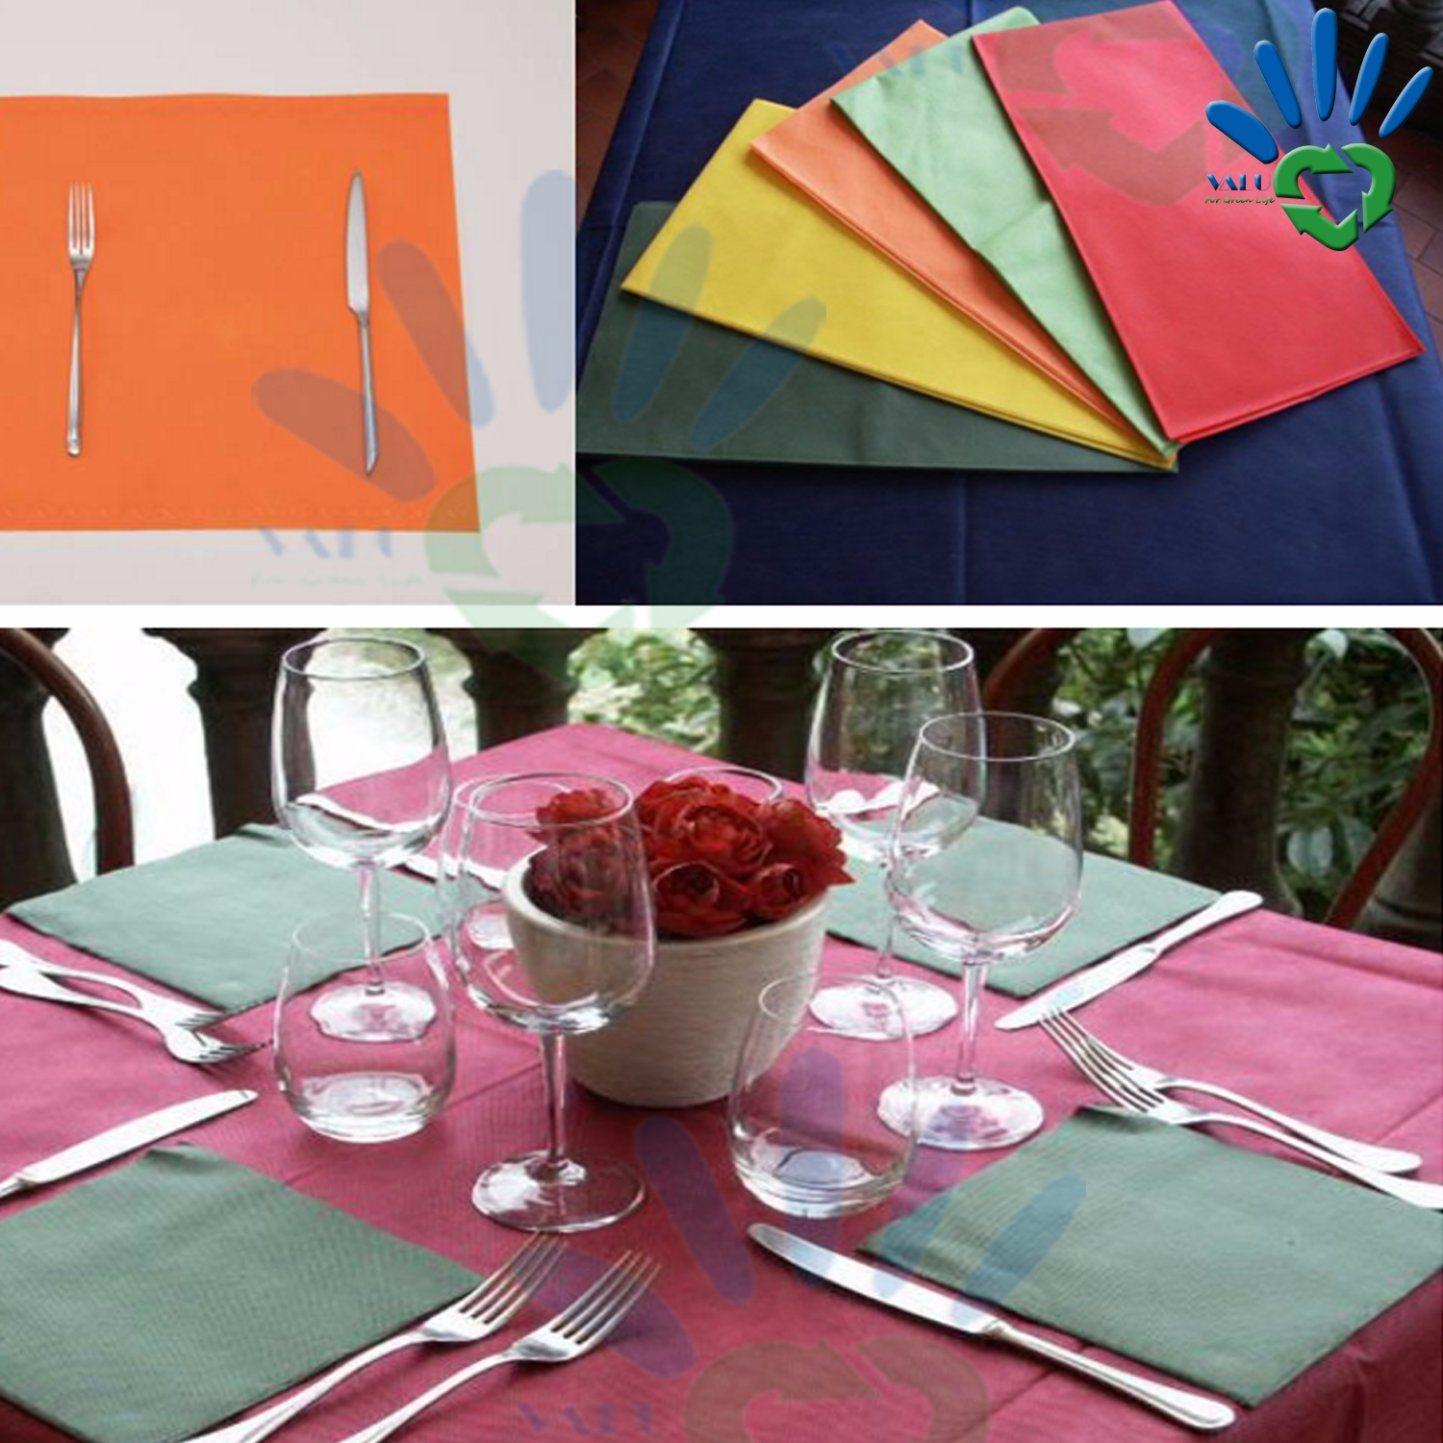 china wedding decoration christmas coloring tablecloth for wedding china wedding decoration table cloth table cover for wedding